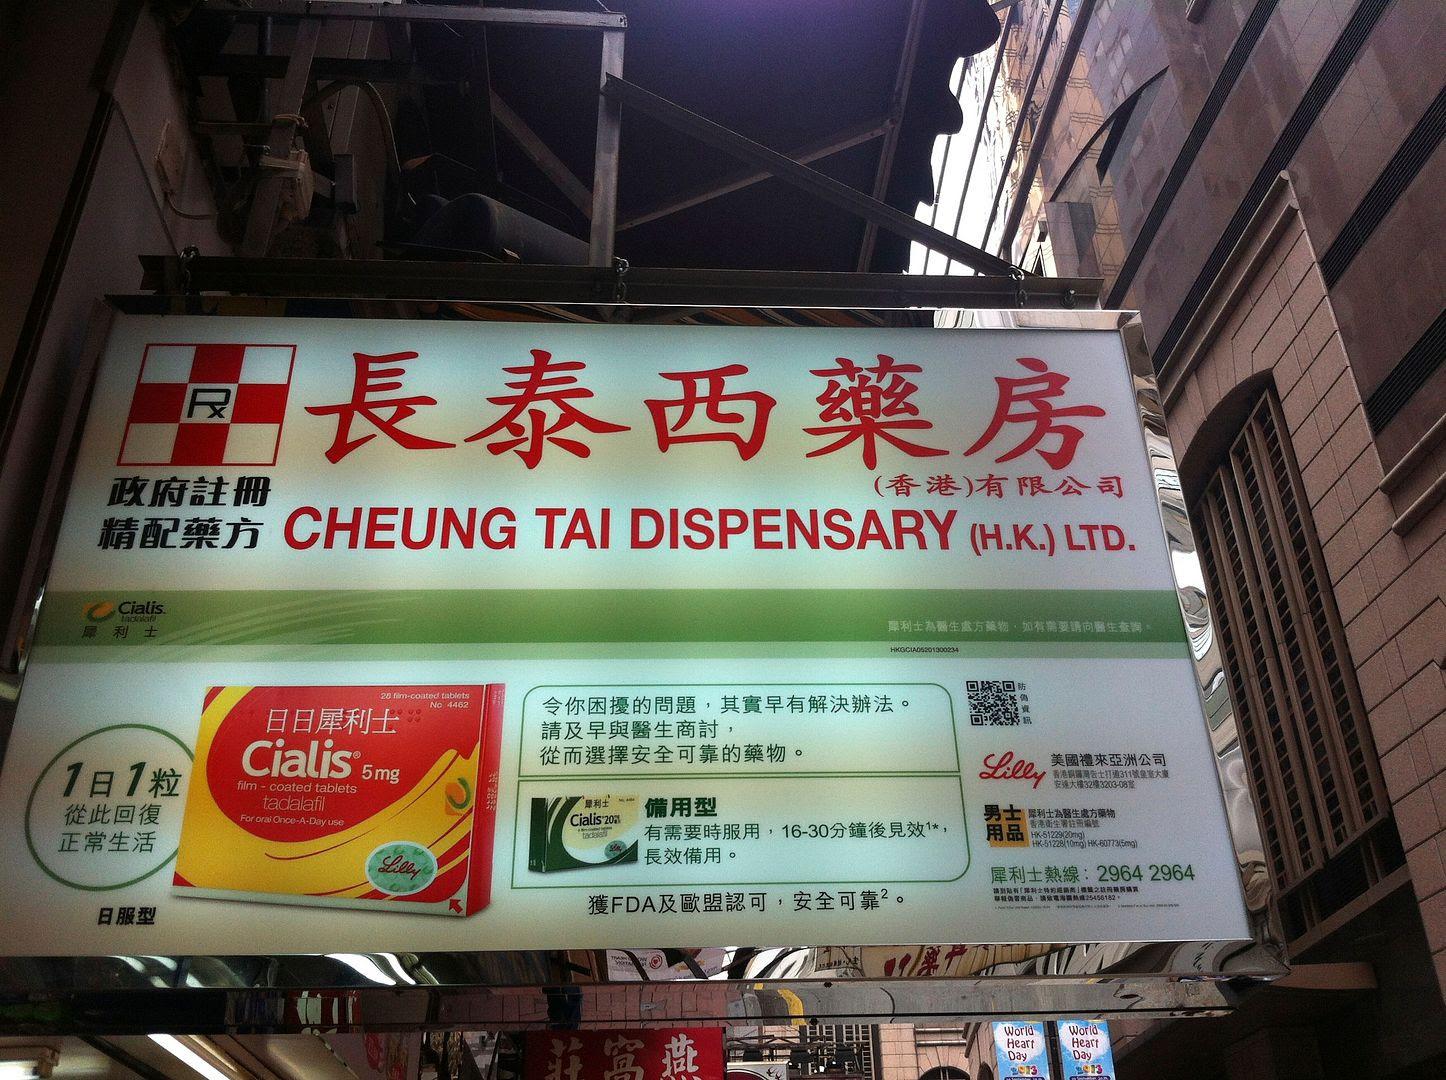 Michael's Pharmacy in Hong Kong photo 2013-09-28131015_zps89112947.jpg